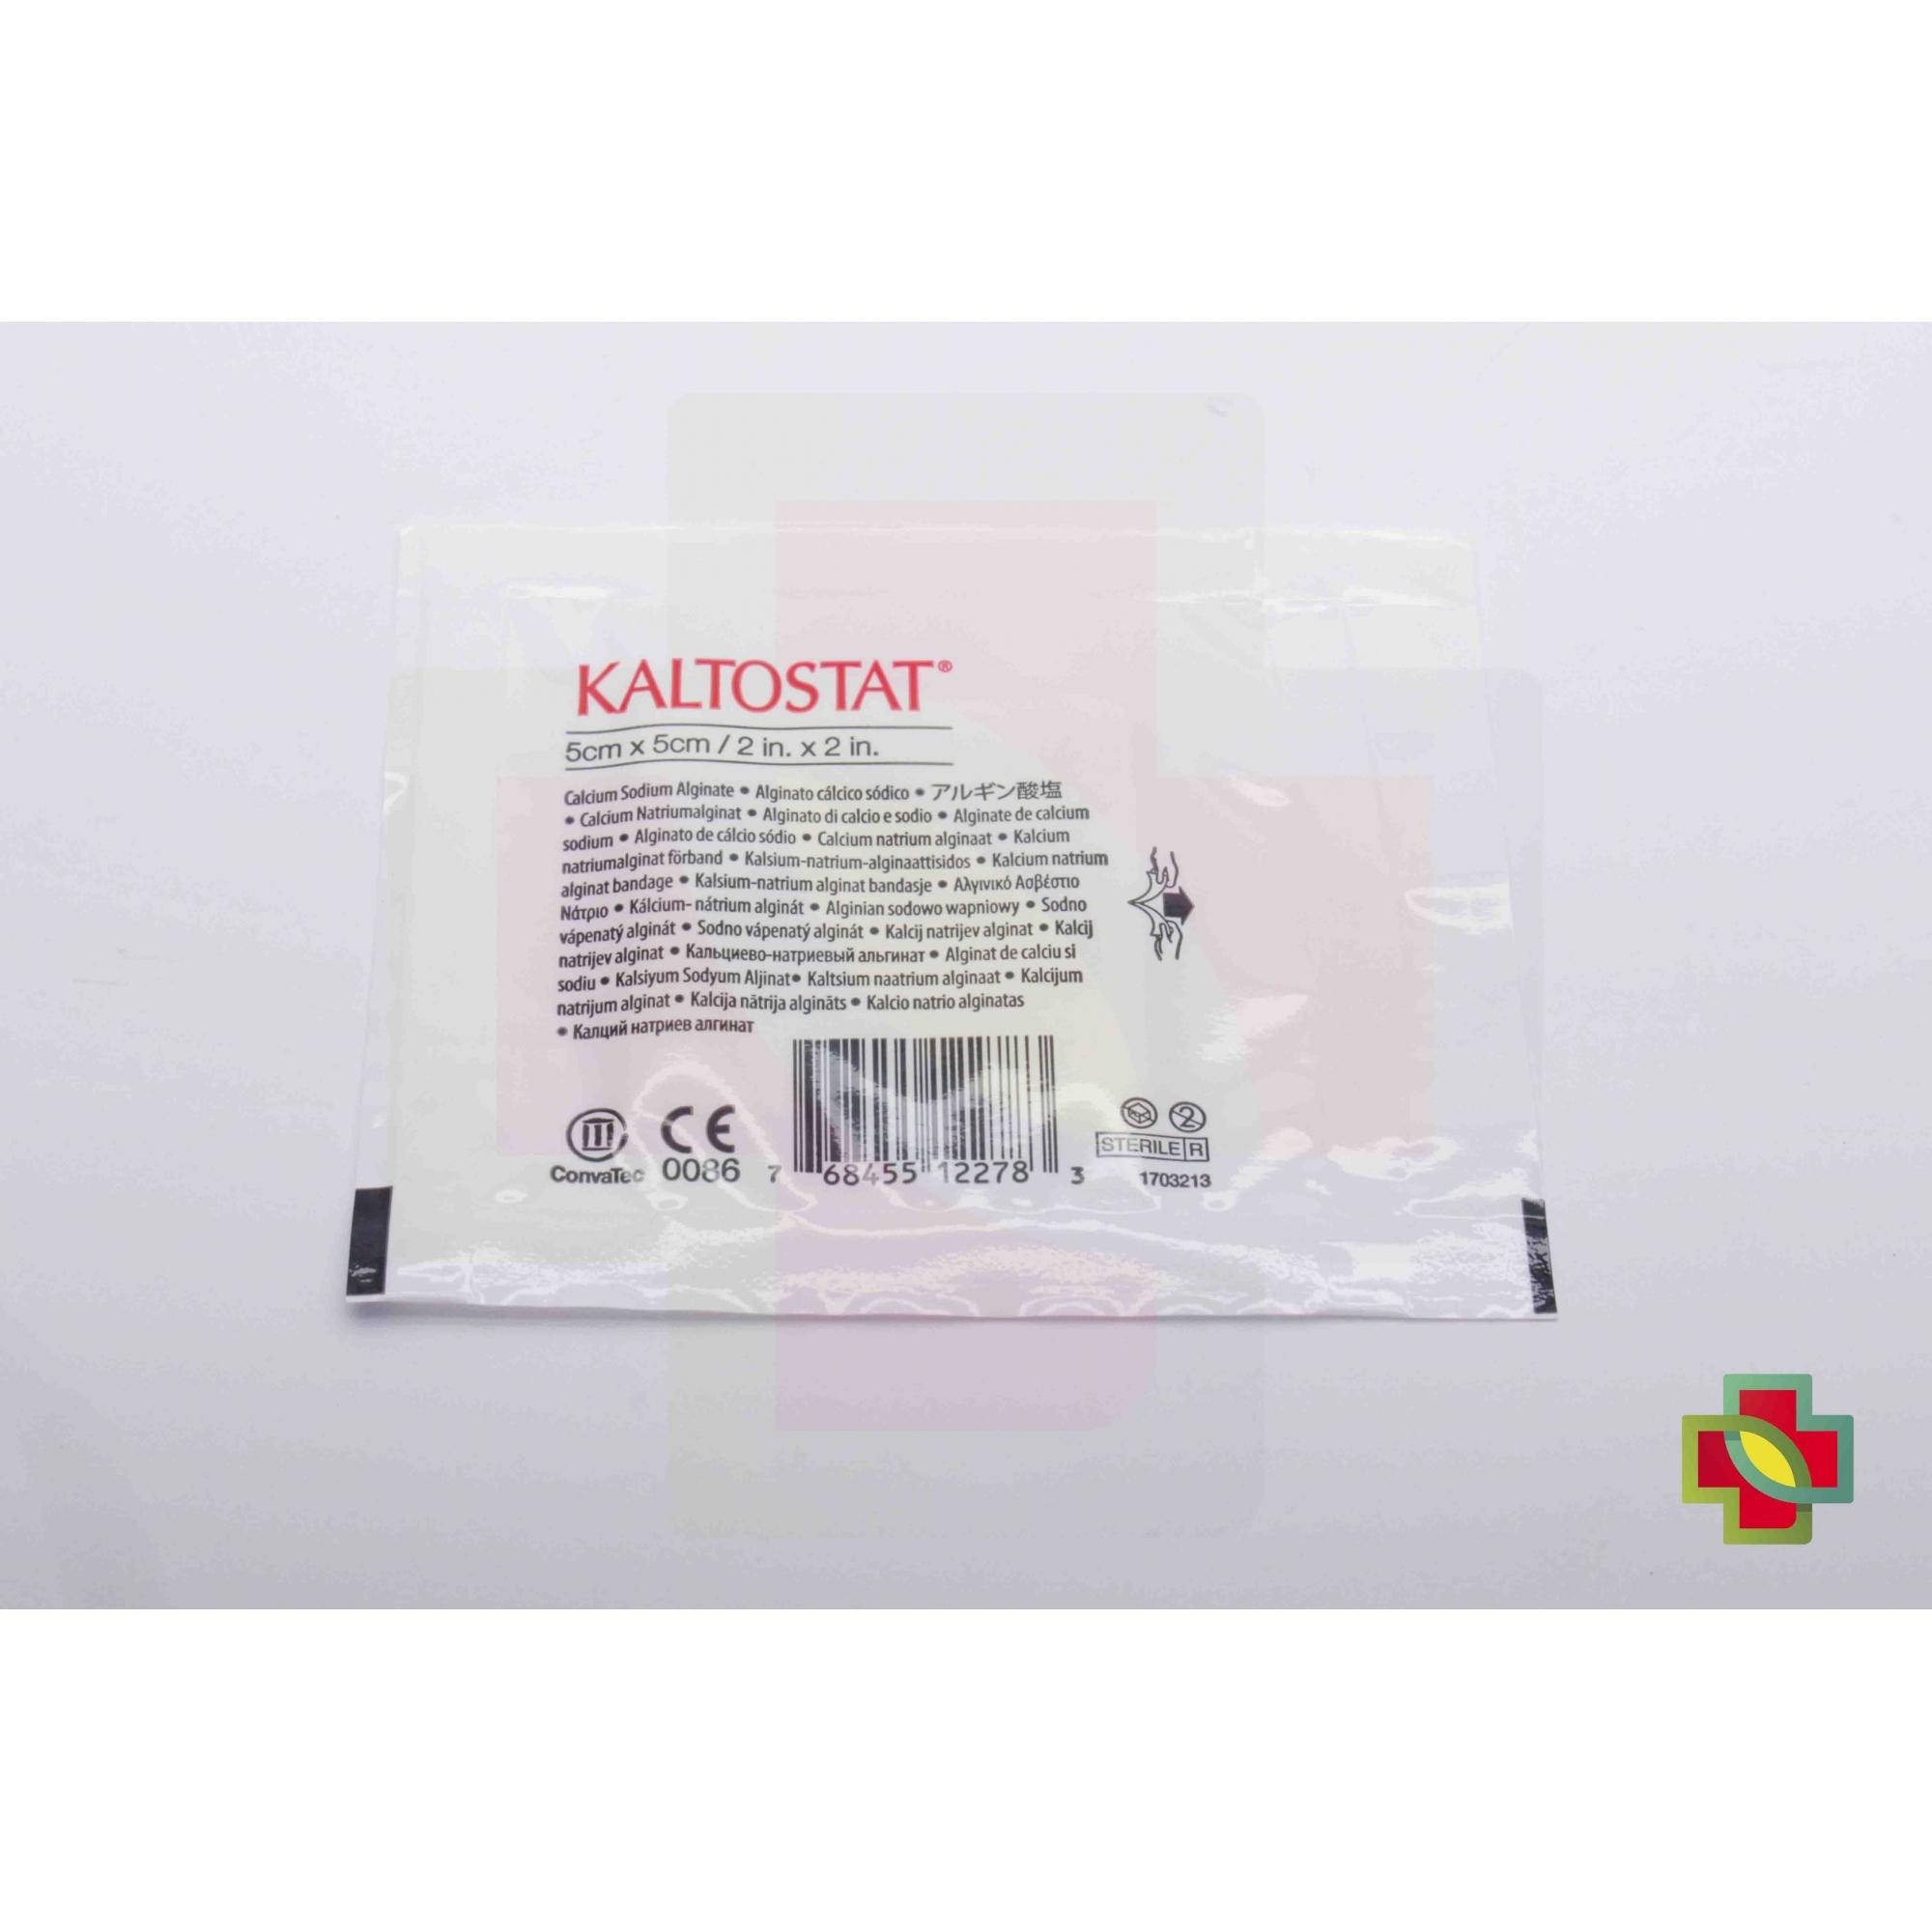 CURATIVO KALTOSTAT 05 X 05 UND. 168210 - CONVATEC